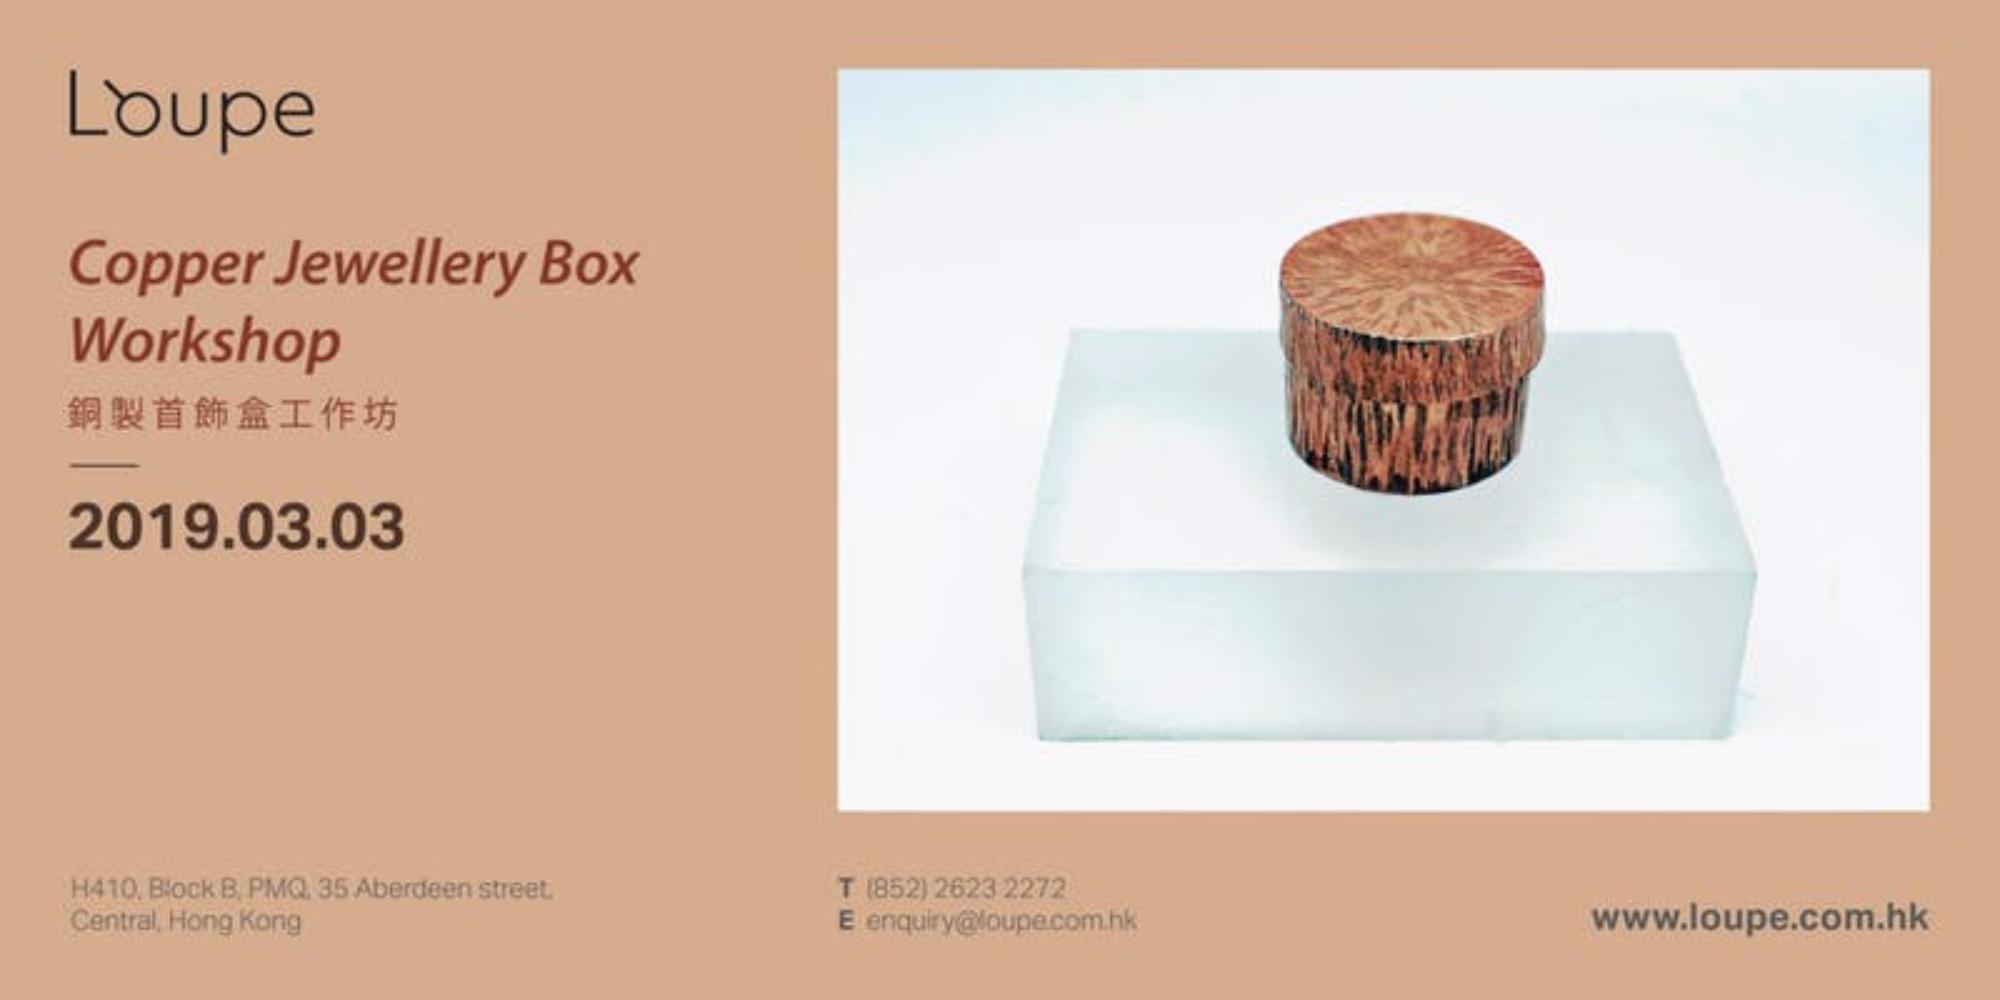 Loupe workshop: Copper Jewellery Box Workshop 銅製首飾盒工作坊